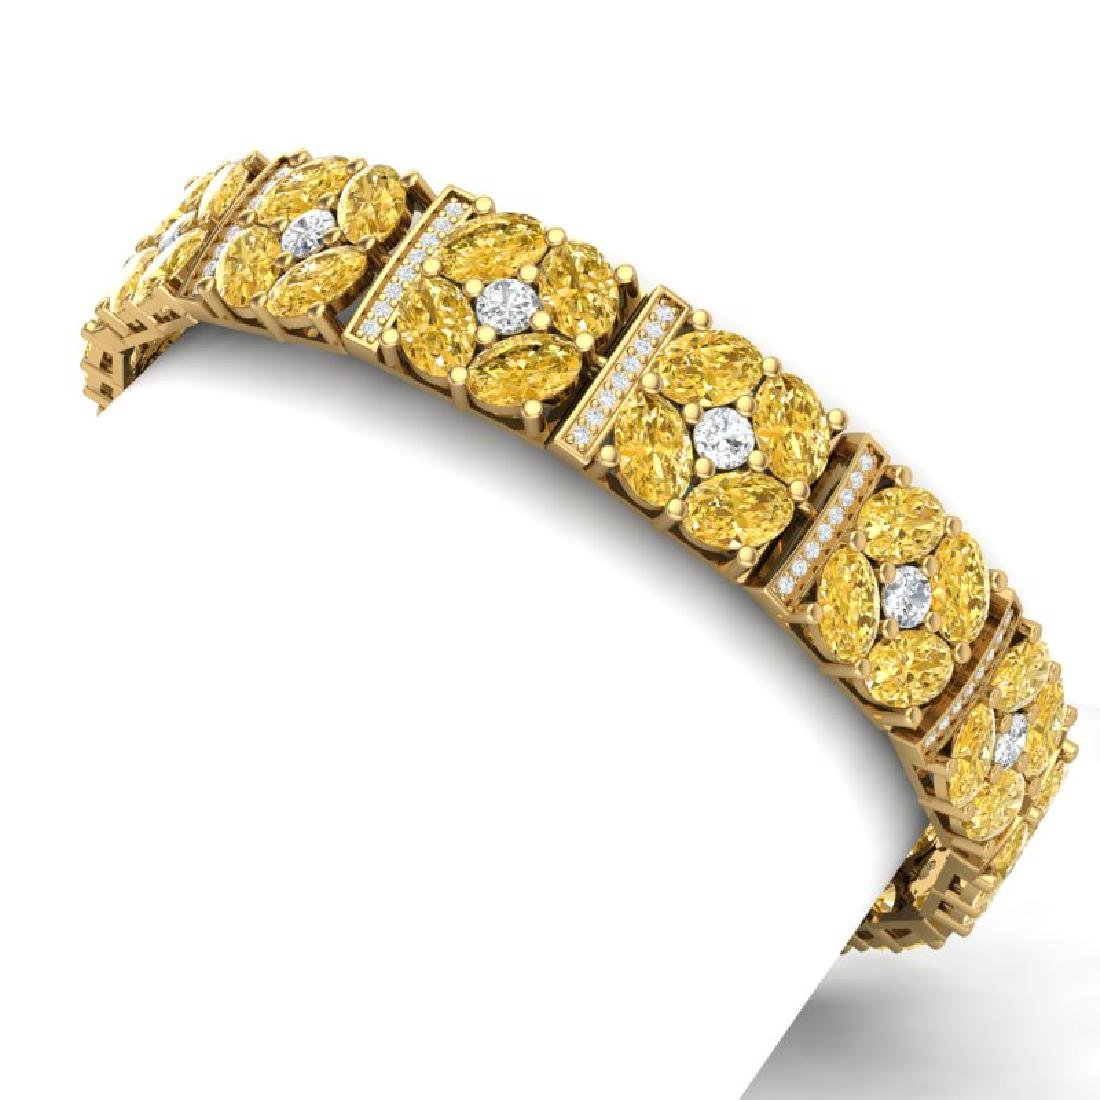 28.95 CTW Royalty Canary Citrine & VS Diamond Bracelet - 2